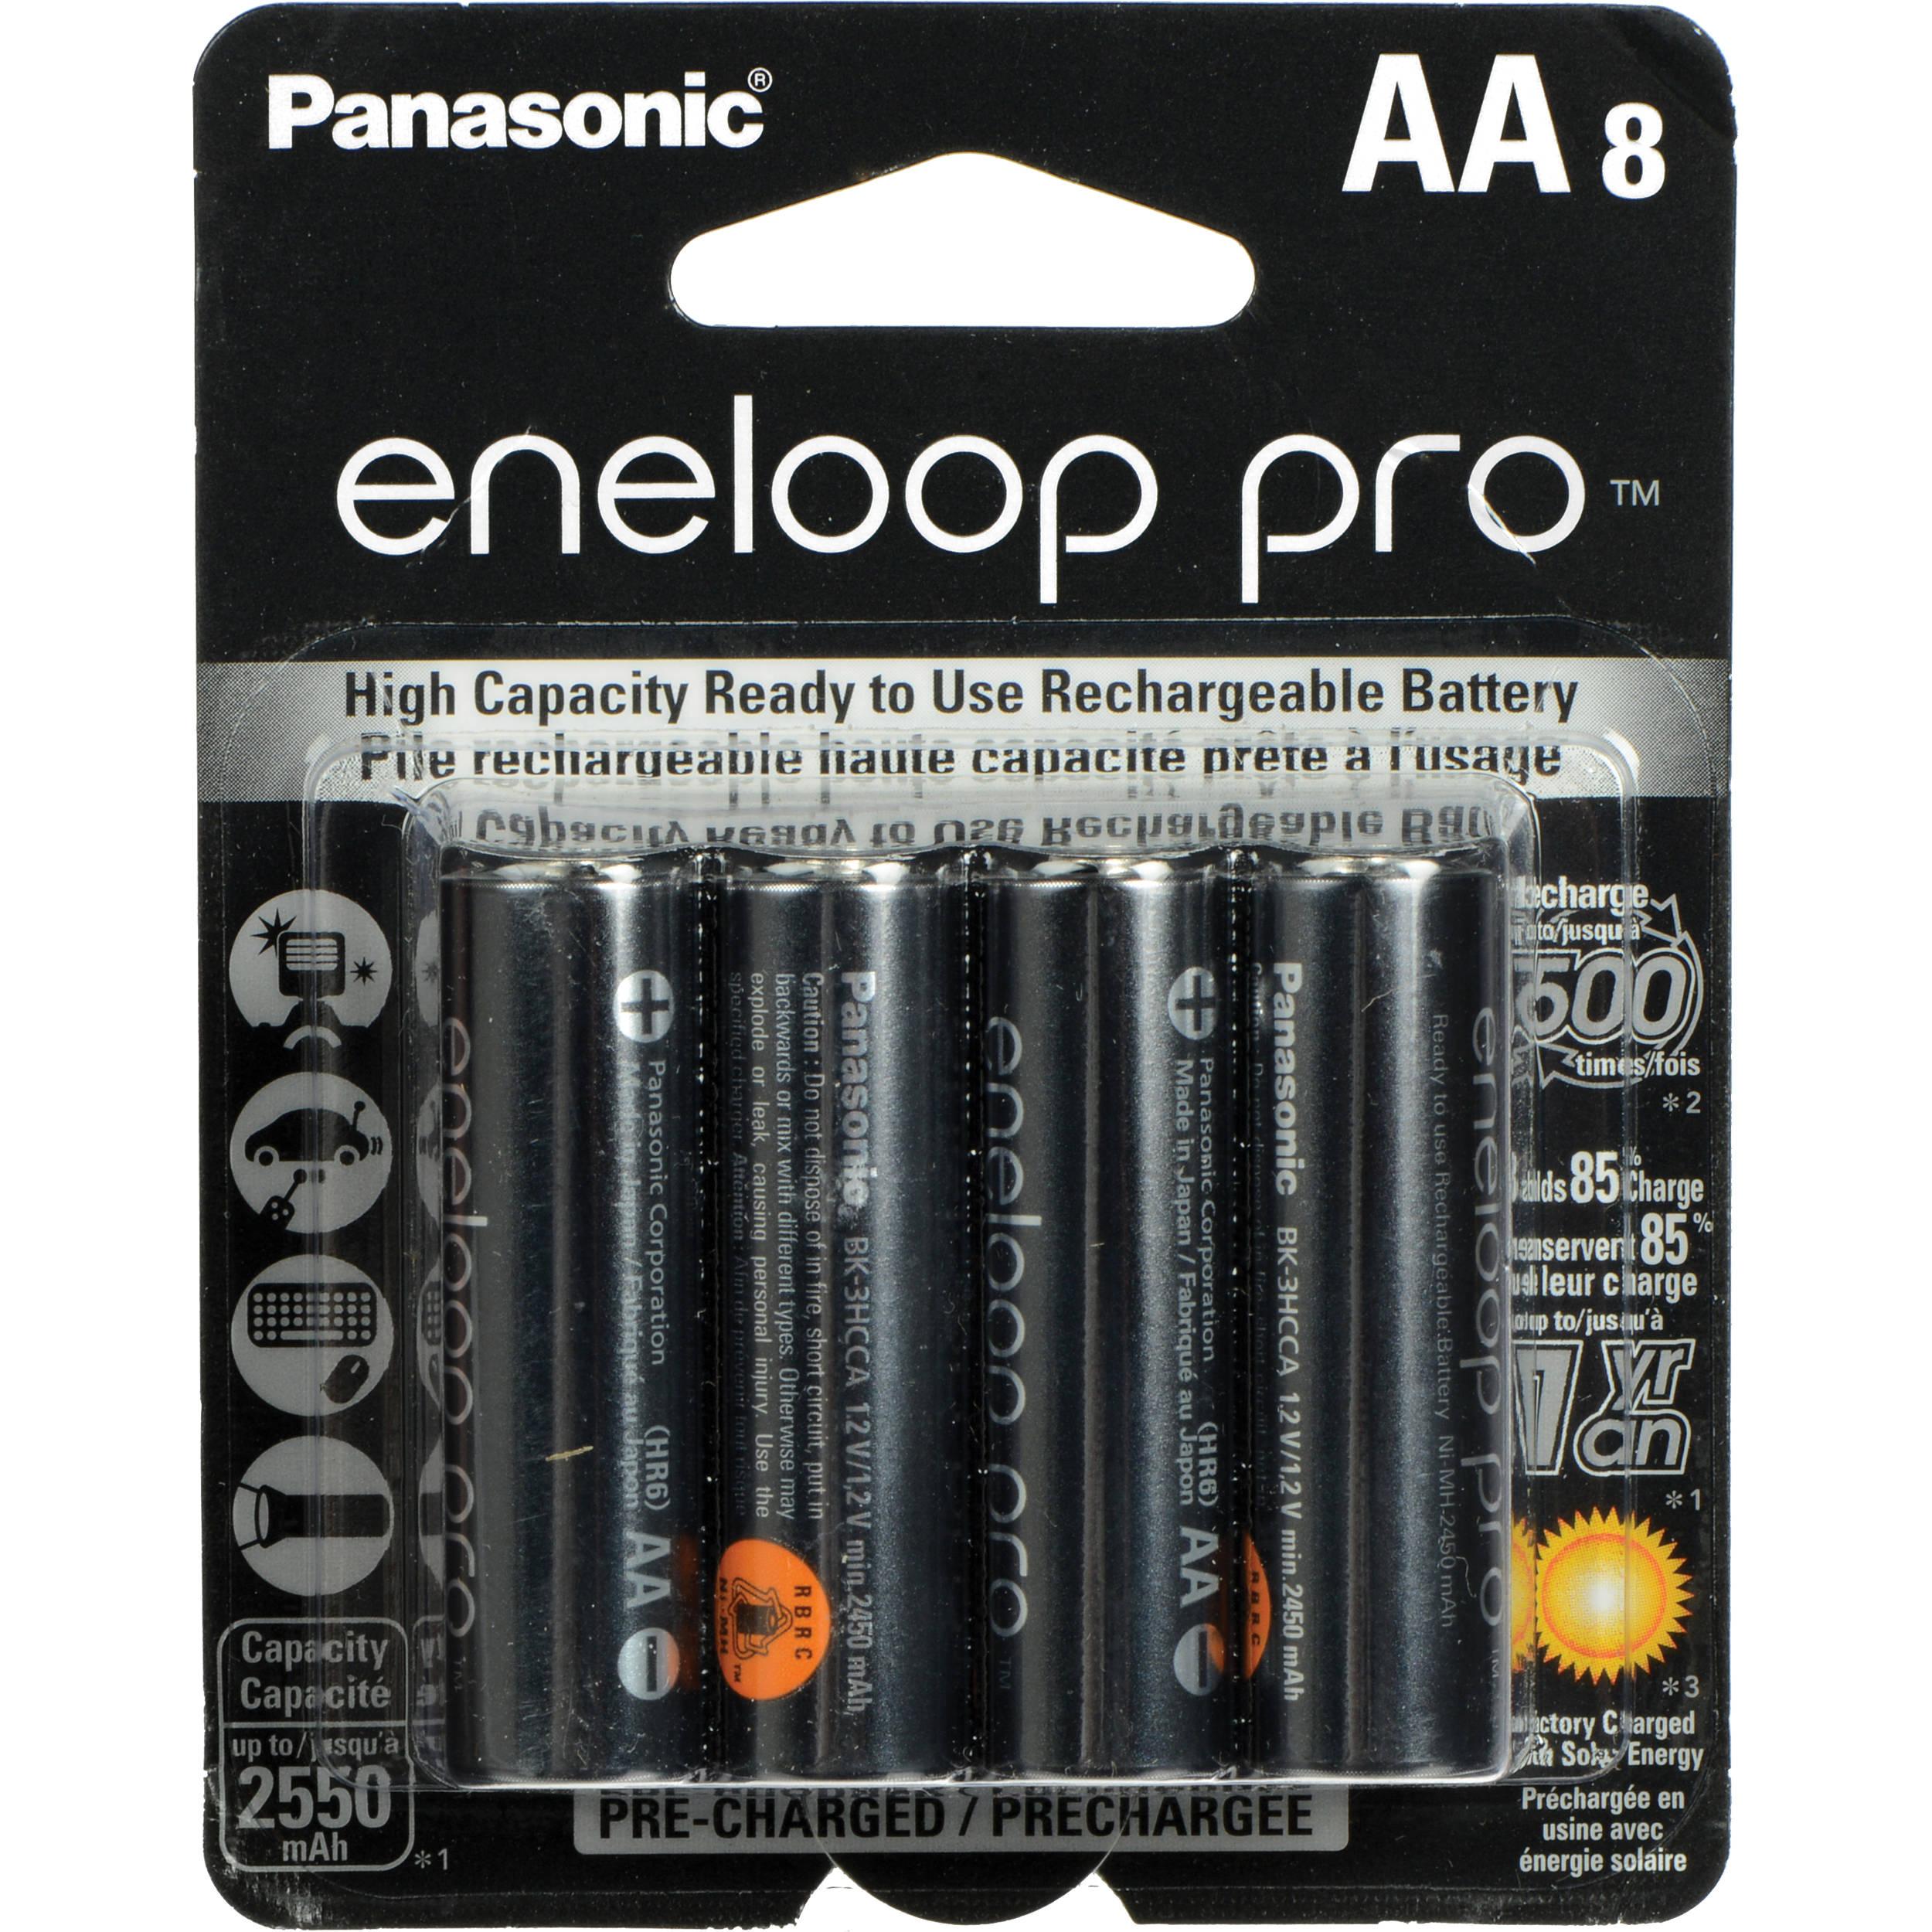 Panasonic eneloop pro AA Rechargeable NiMH Batteries BK-3HCCA8BA